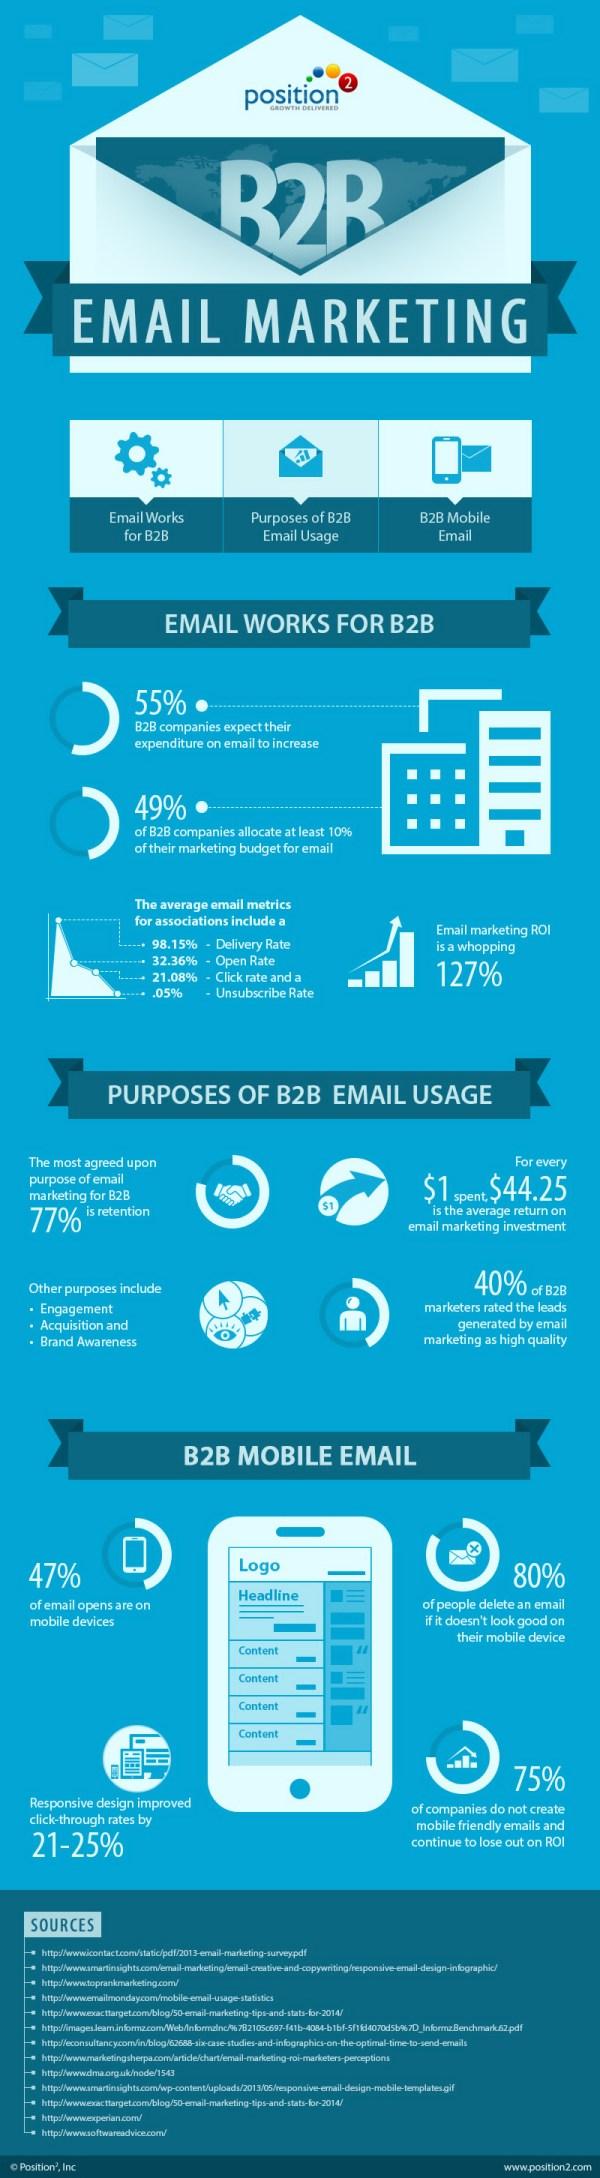 B2B-Email-Marketing-Infographic